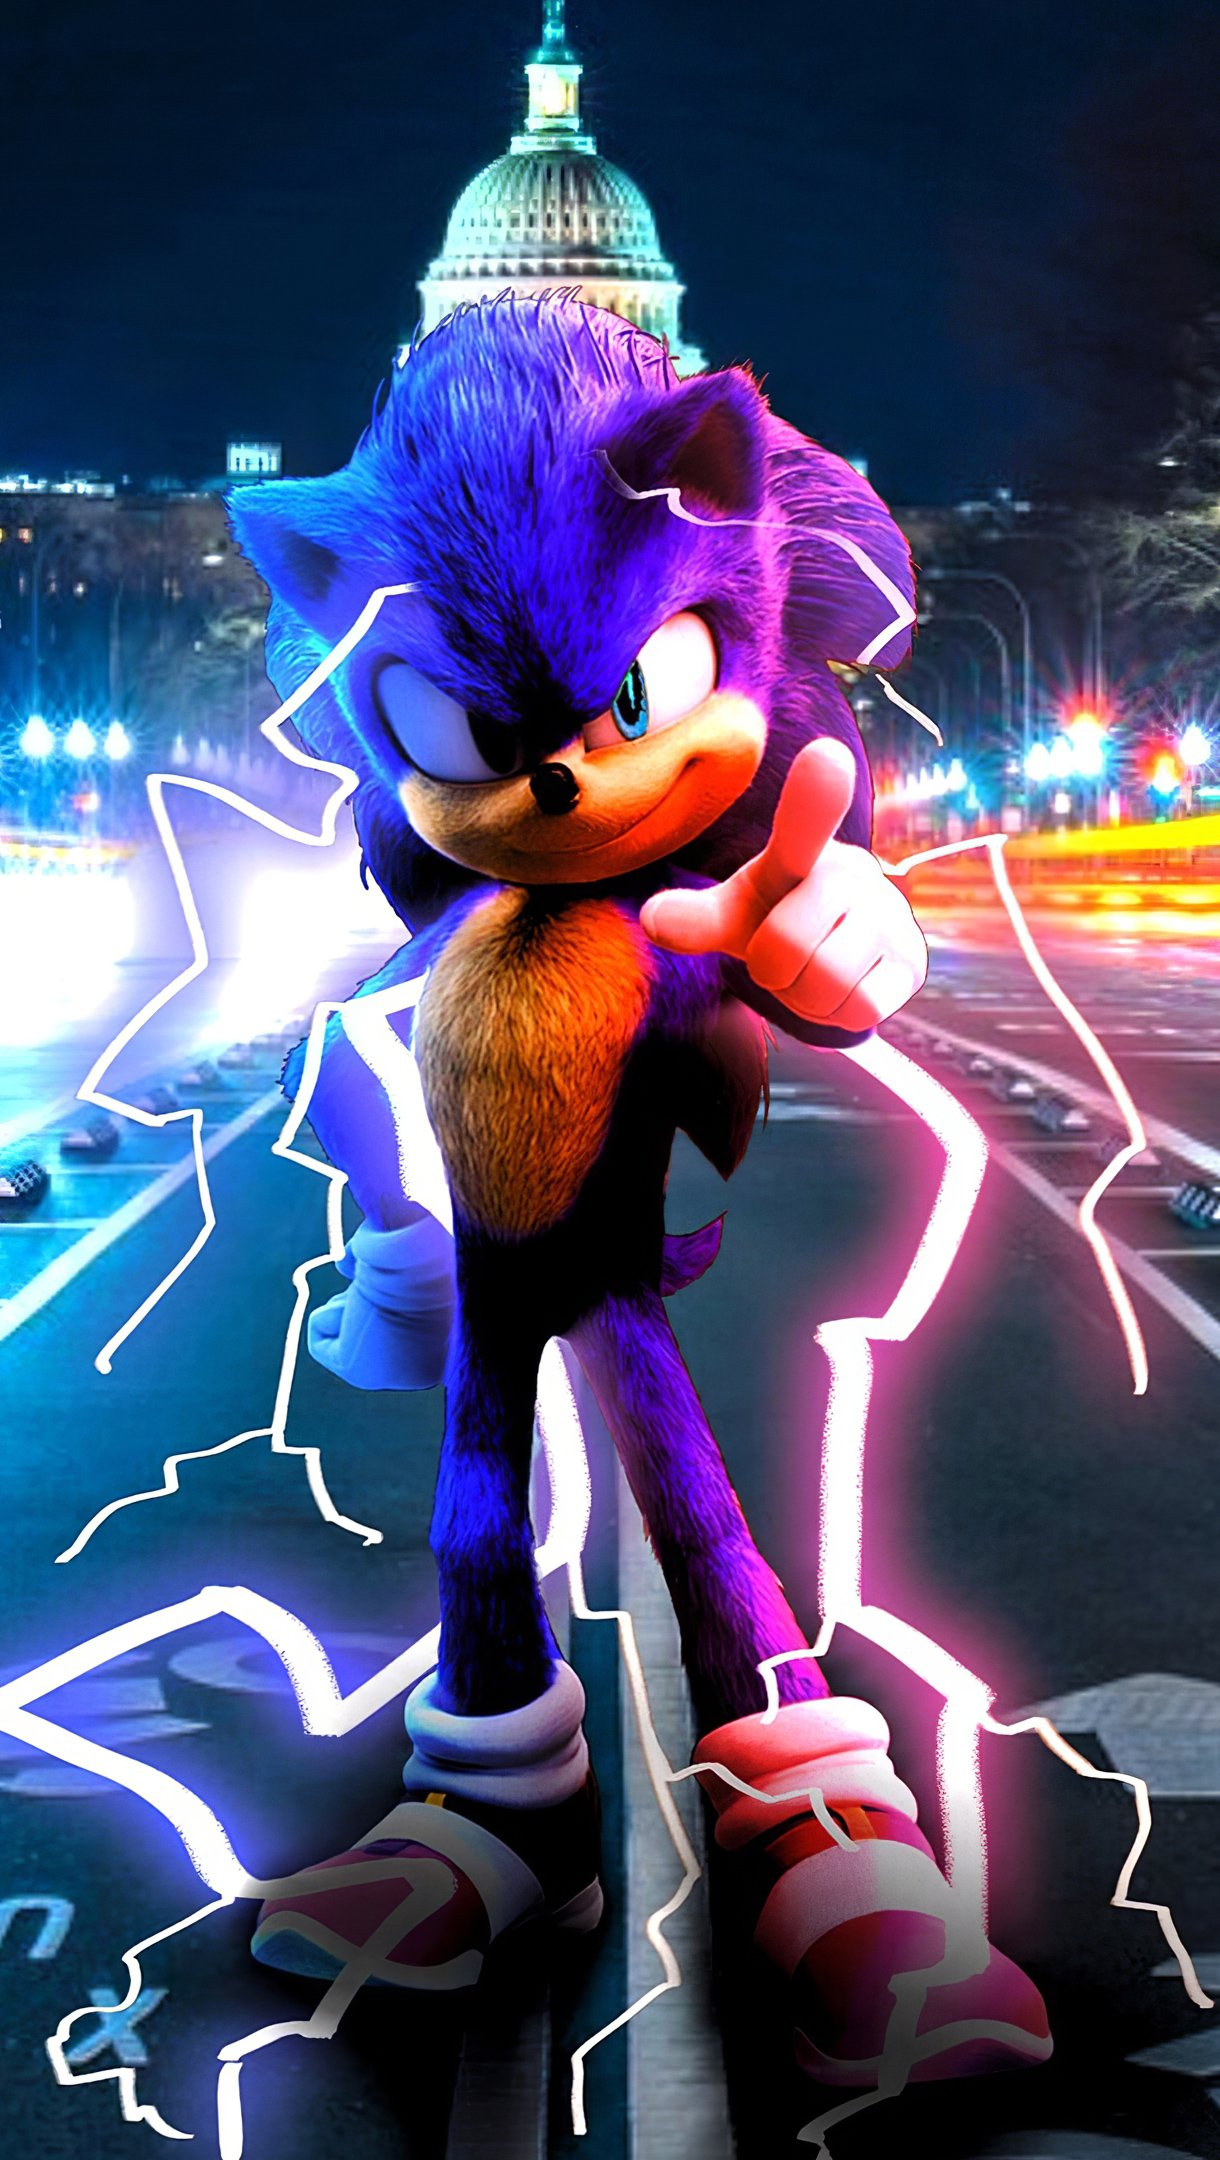 Wallpaper Sonic The Hedgehog Vertical